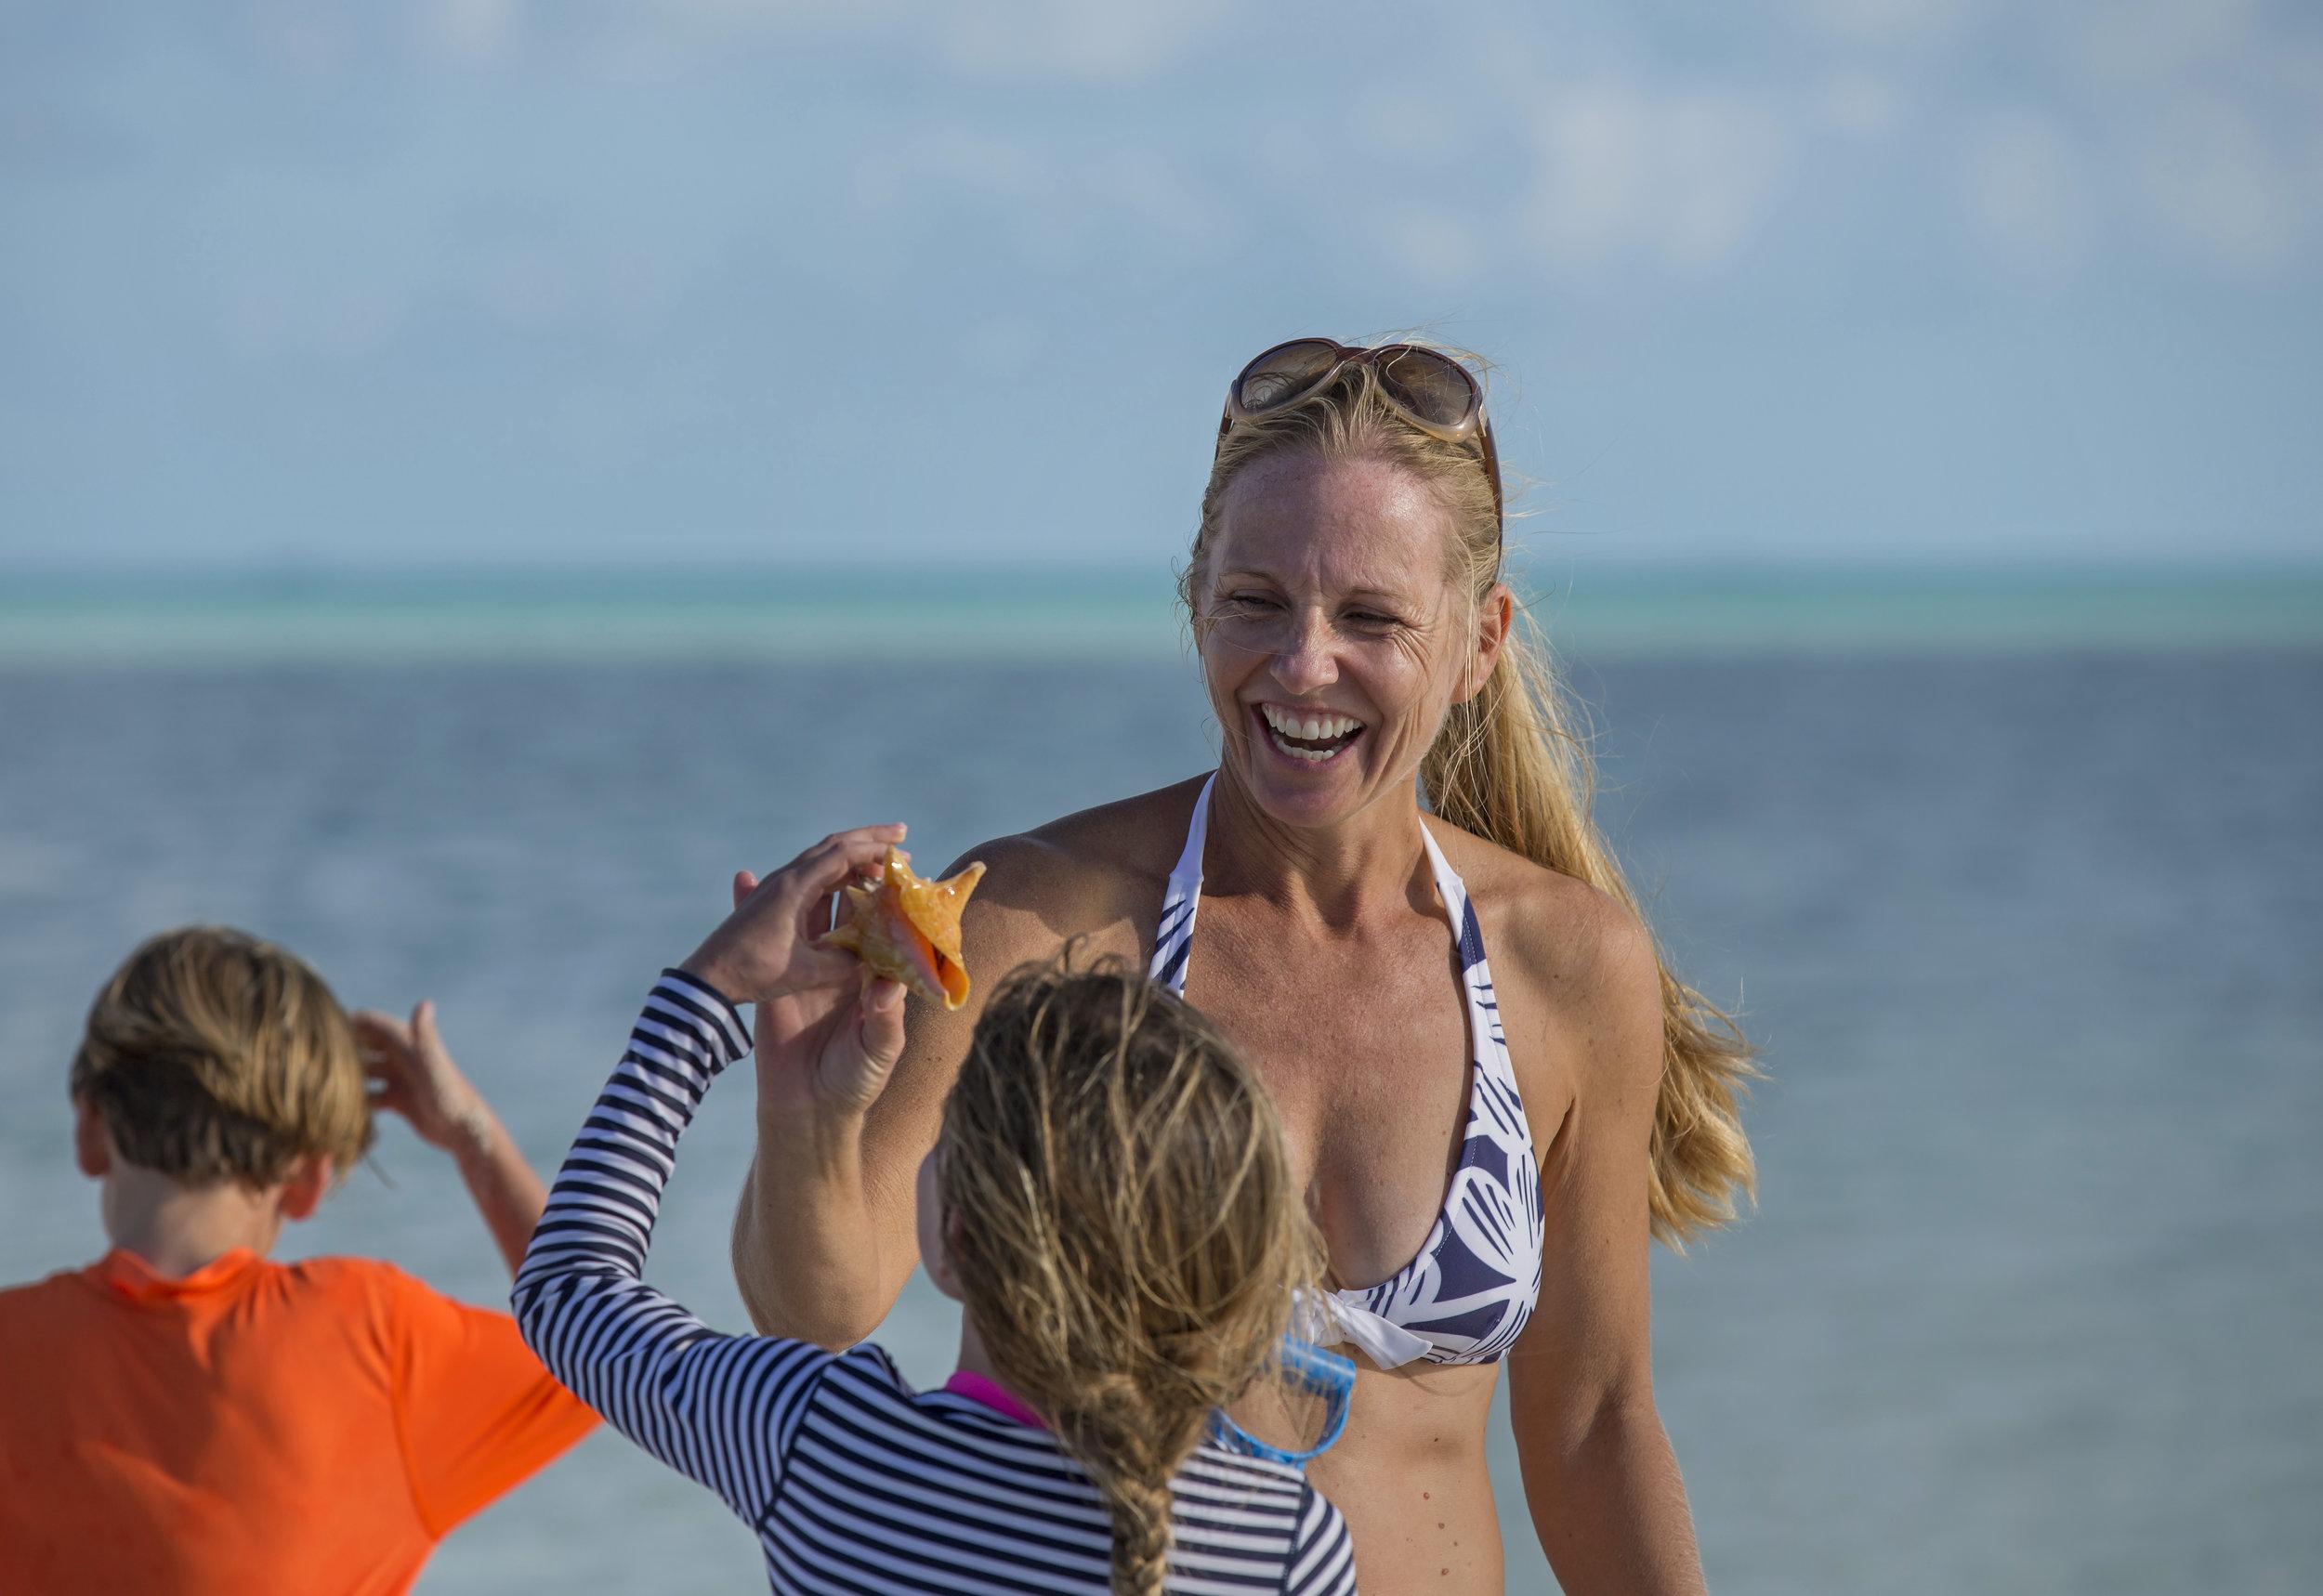 jason-decaires-taylor-Atlas-Yacht-sweet-escape-charter-dive-snorkle-activities-destinations-bahamas-luxury-eco-tourism-mdermaid-copperfield-rudder-cut-cay-exuma-shells-sand-bar-bank